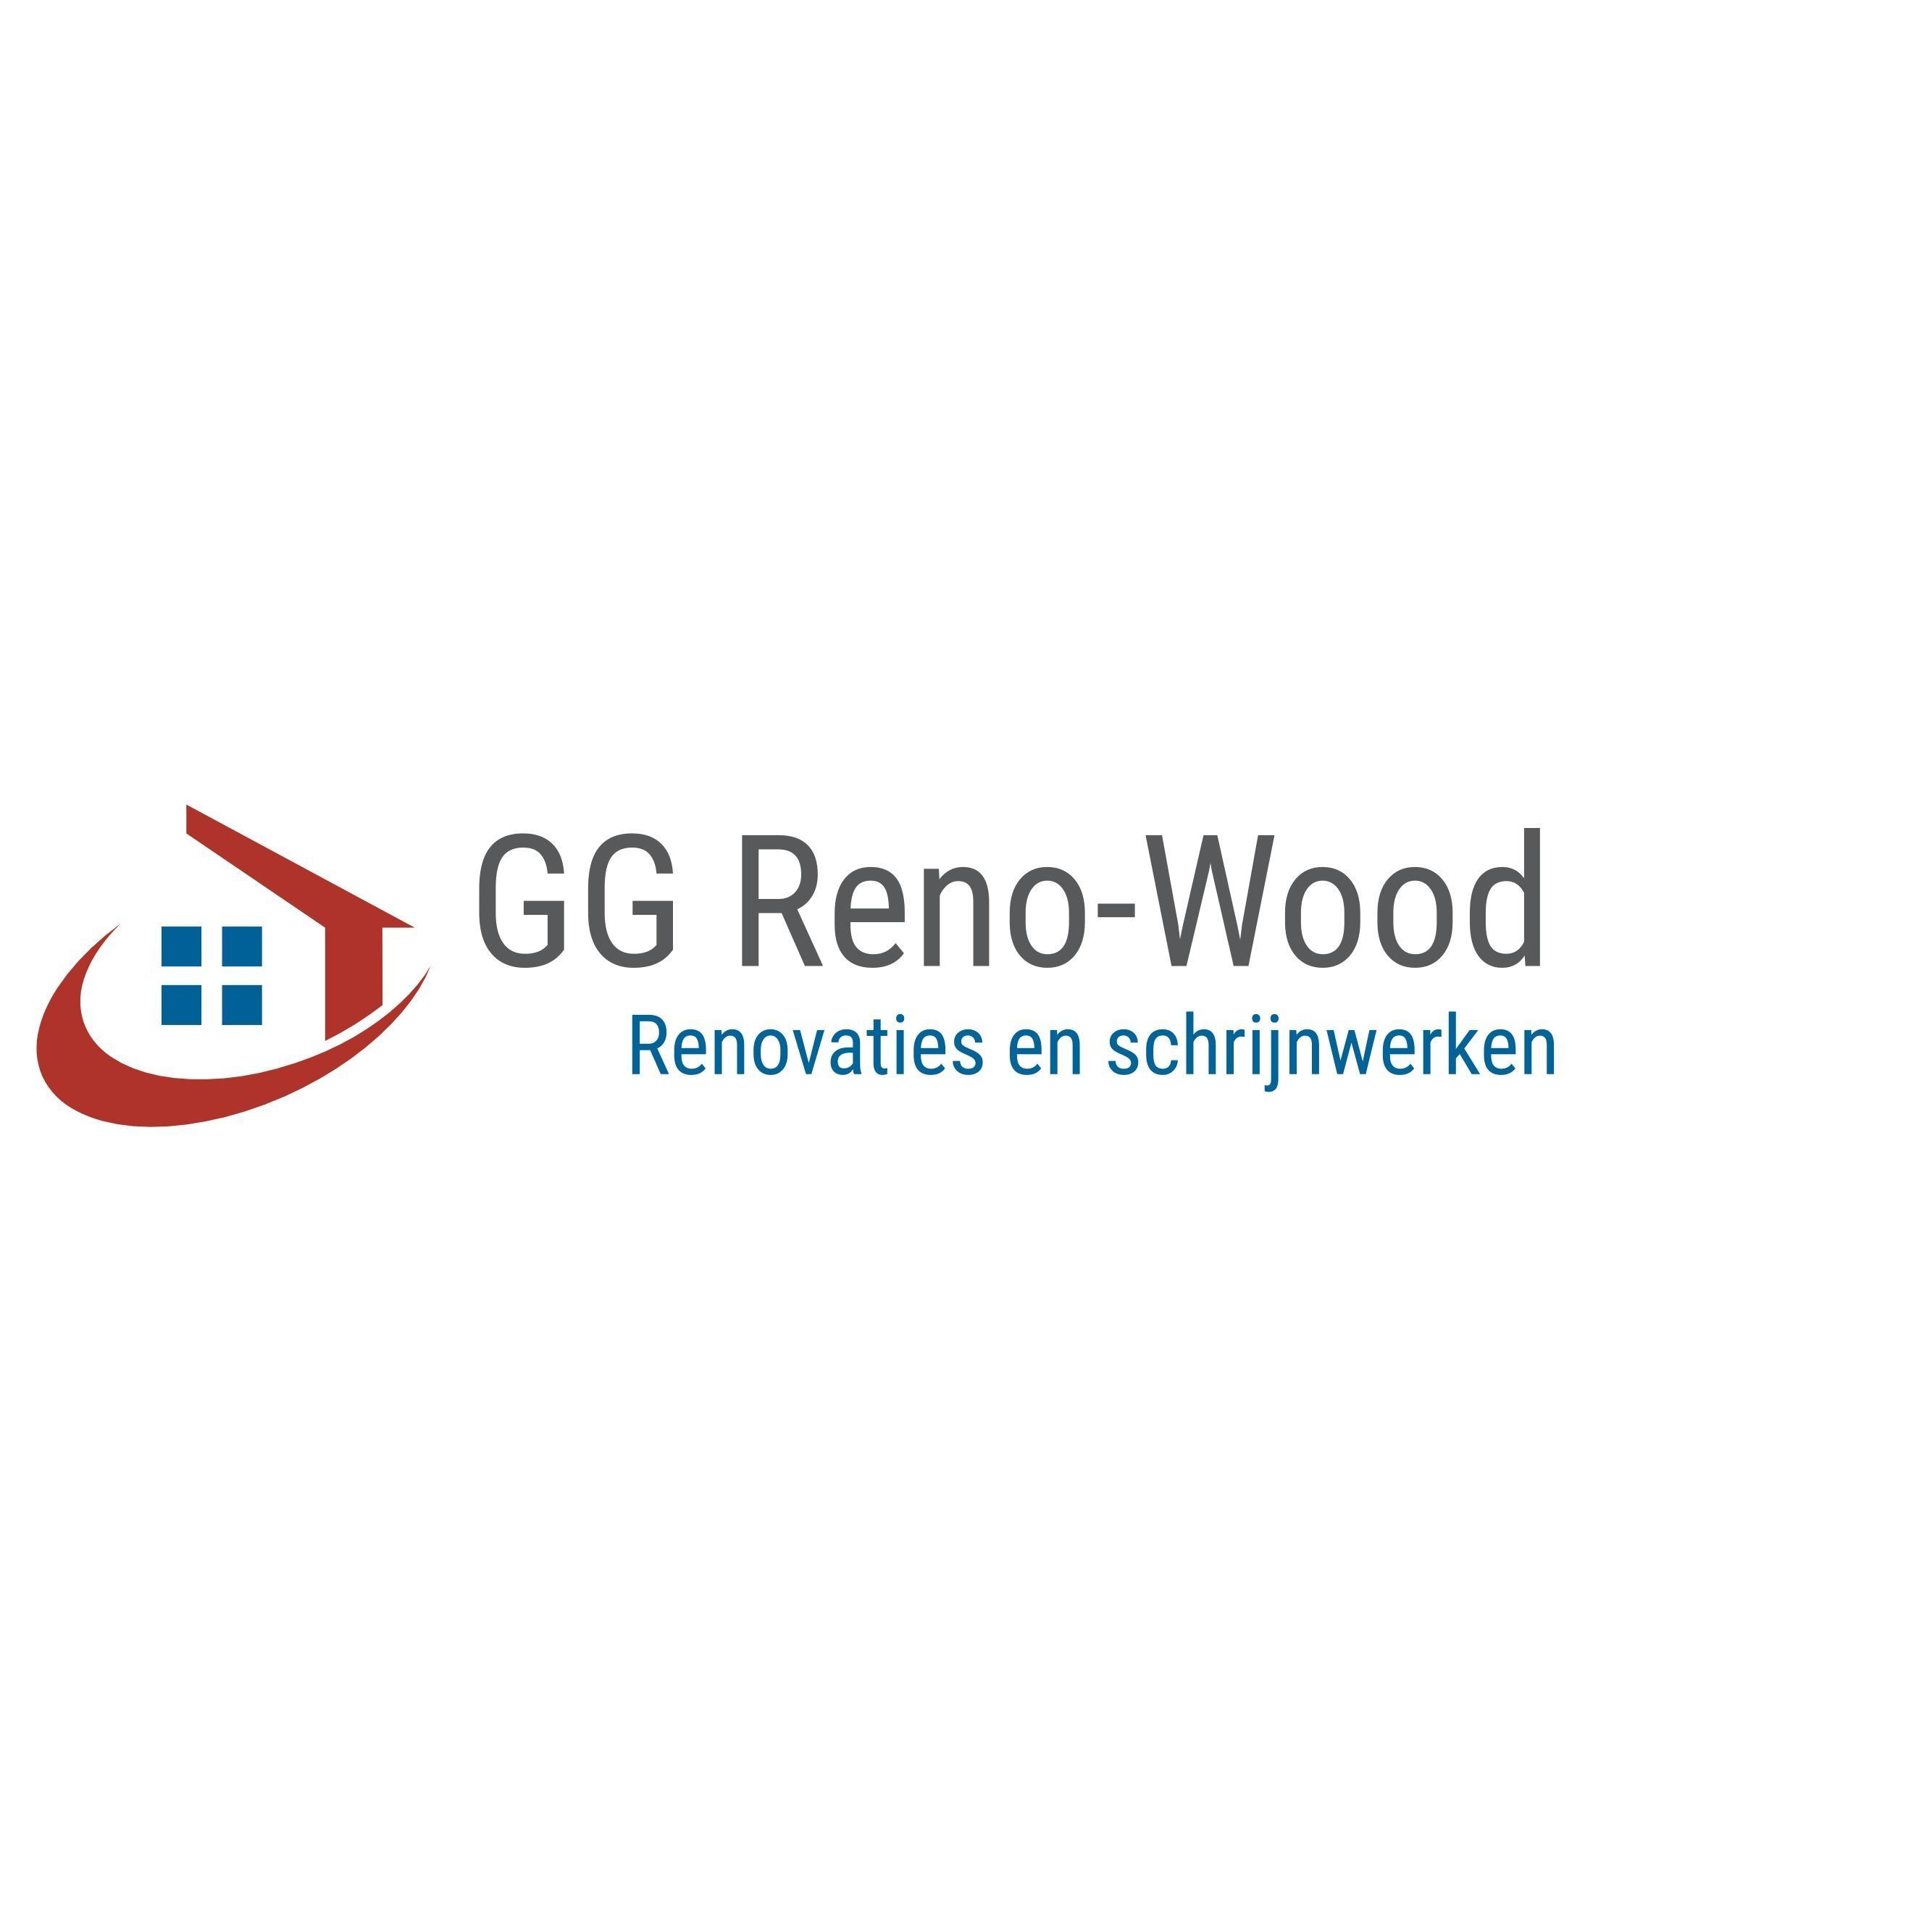 GG Reno-Wood